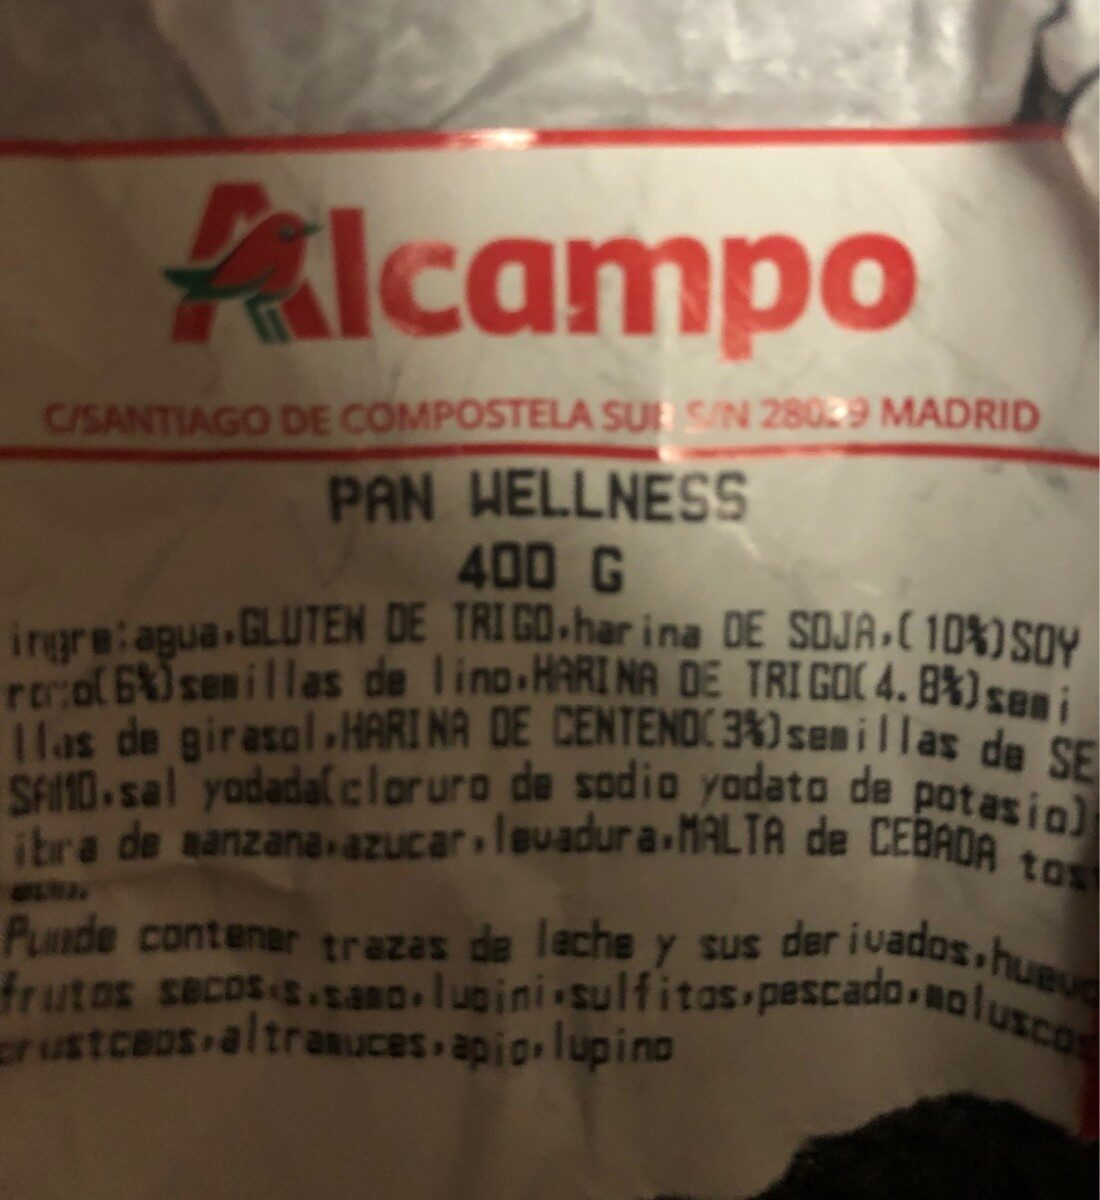 Pan wellness - Product